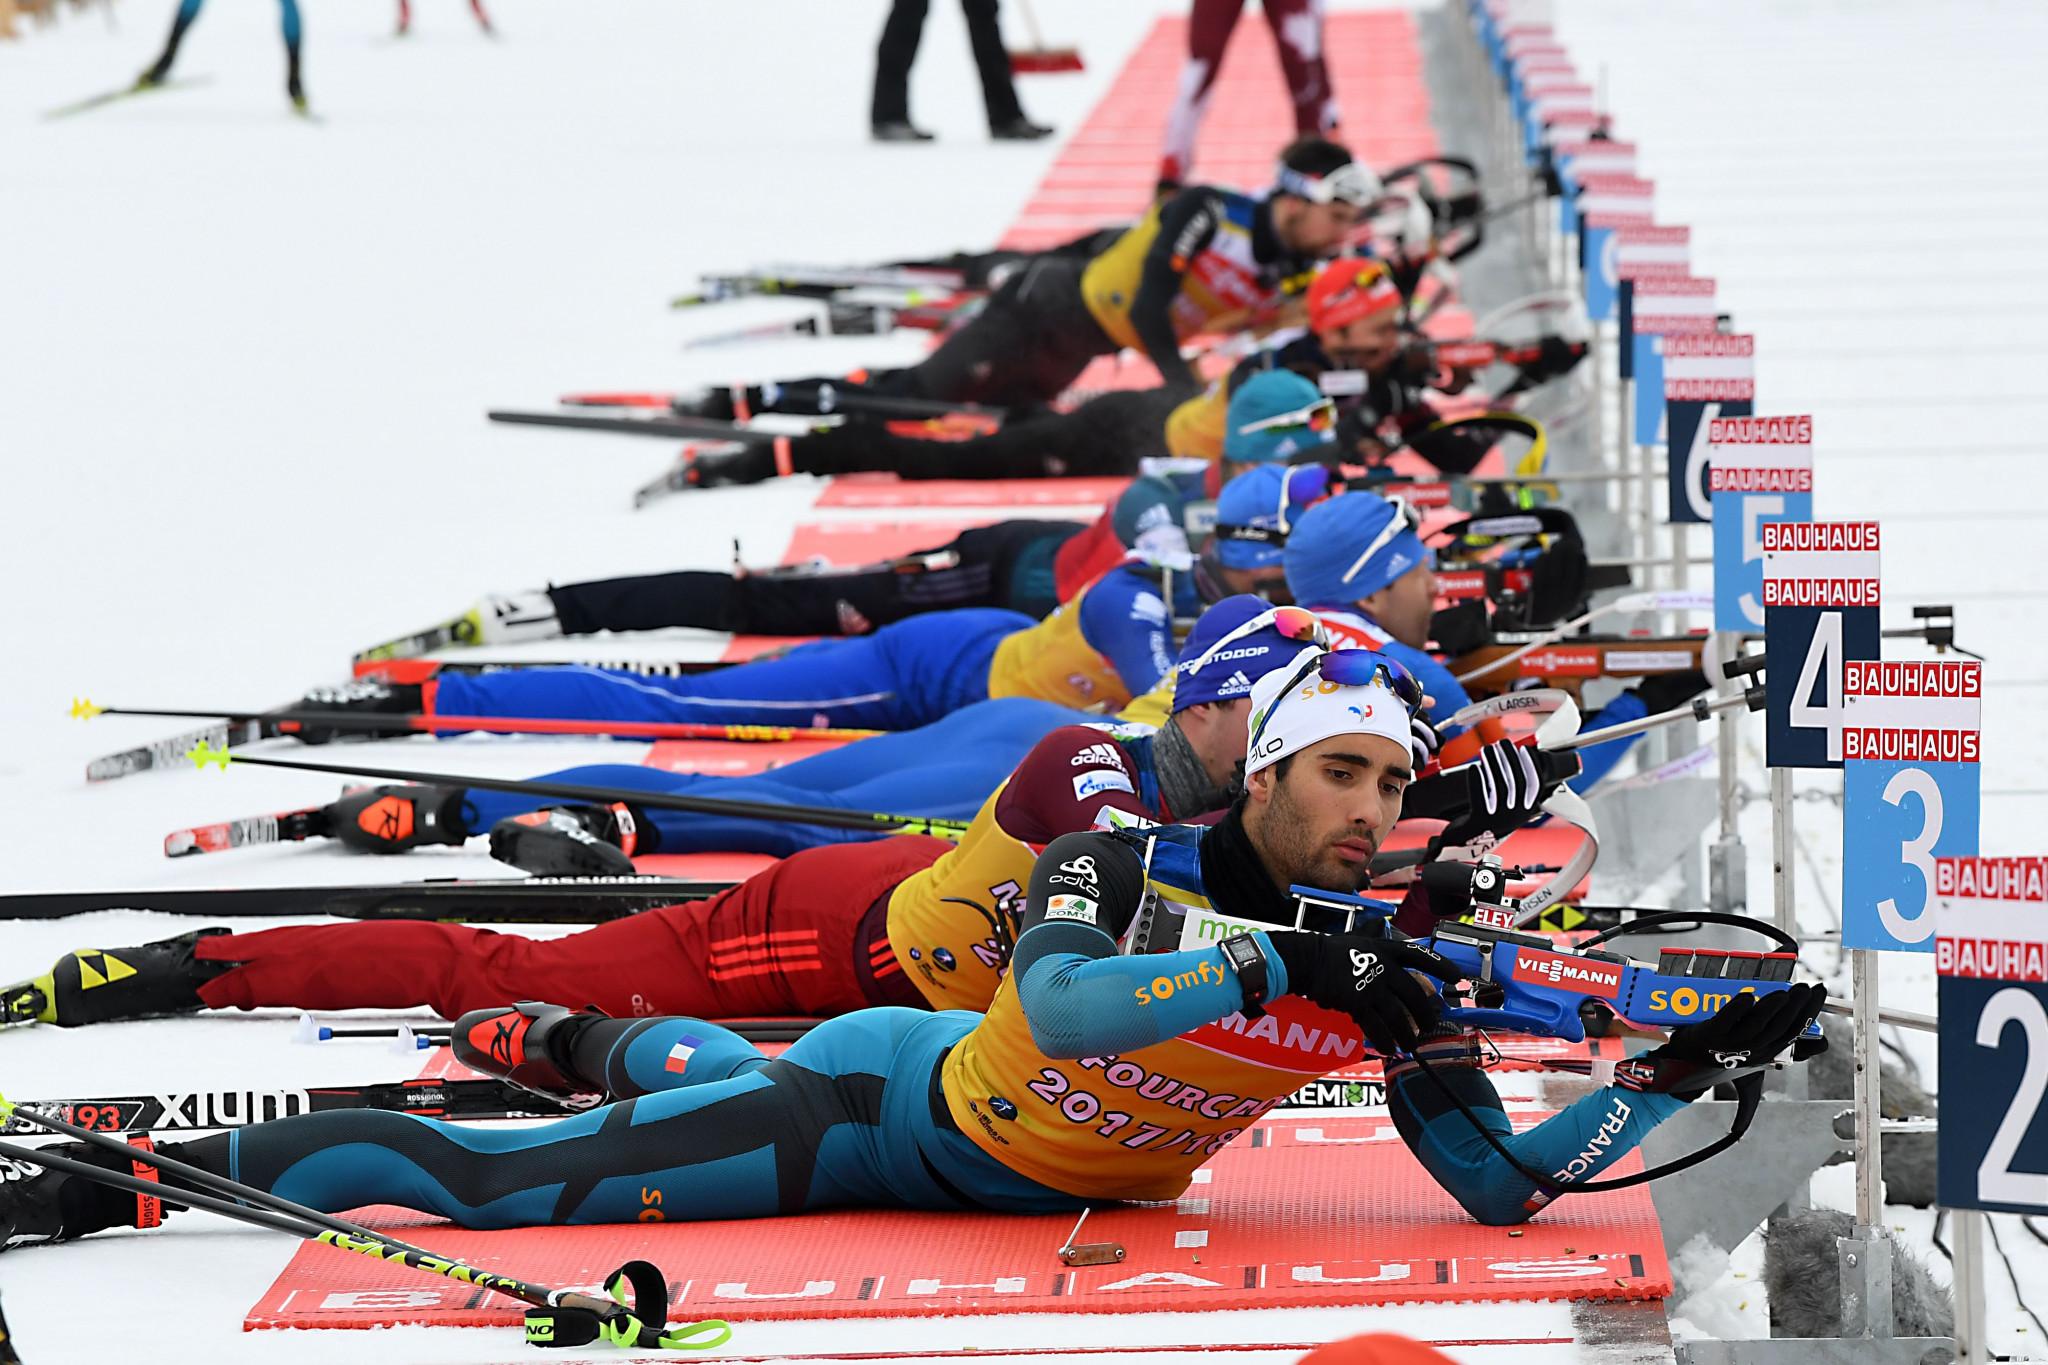 Canada inform IBU of plans to boycott Biathlon World Cup Finals in Russia